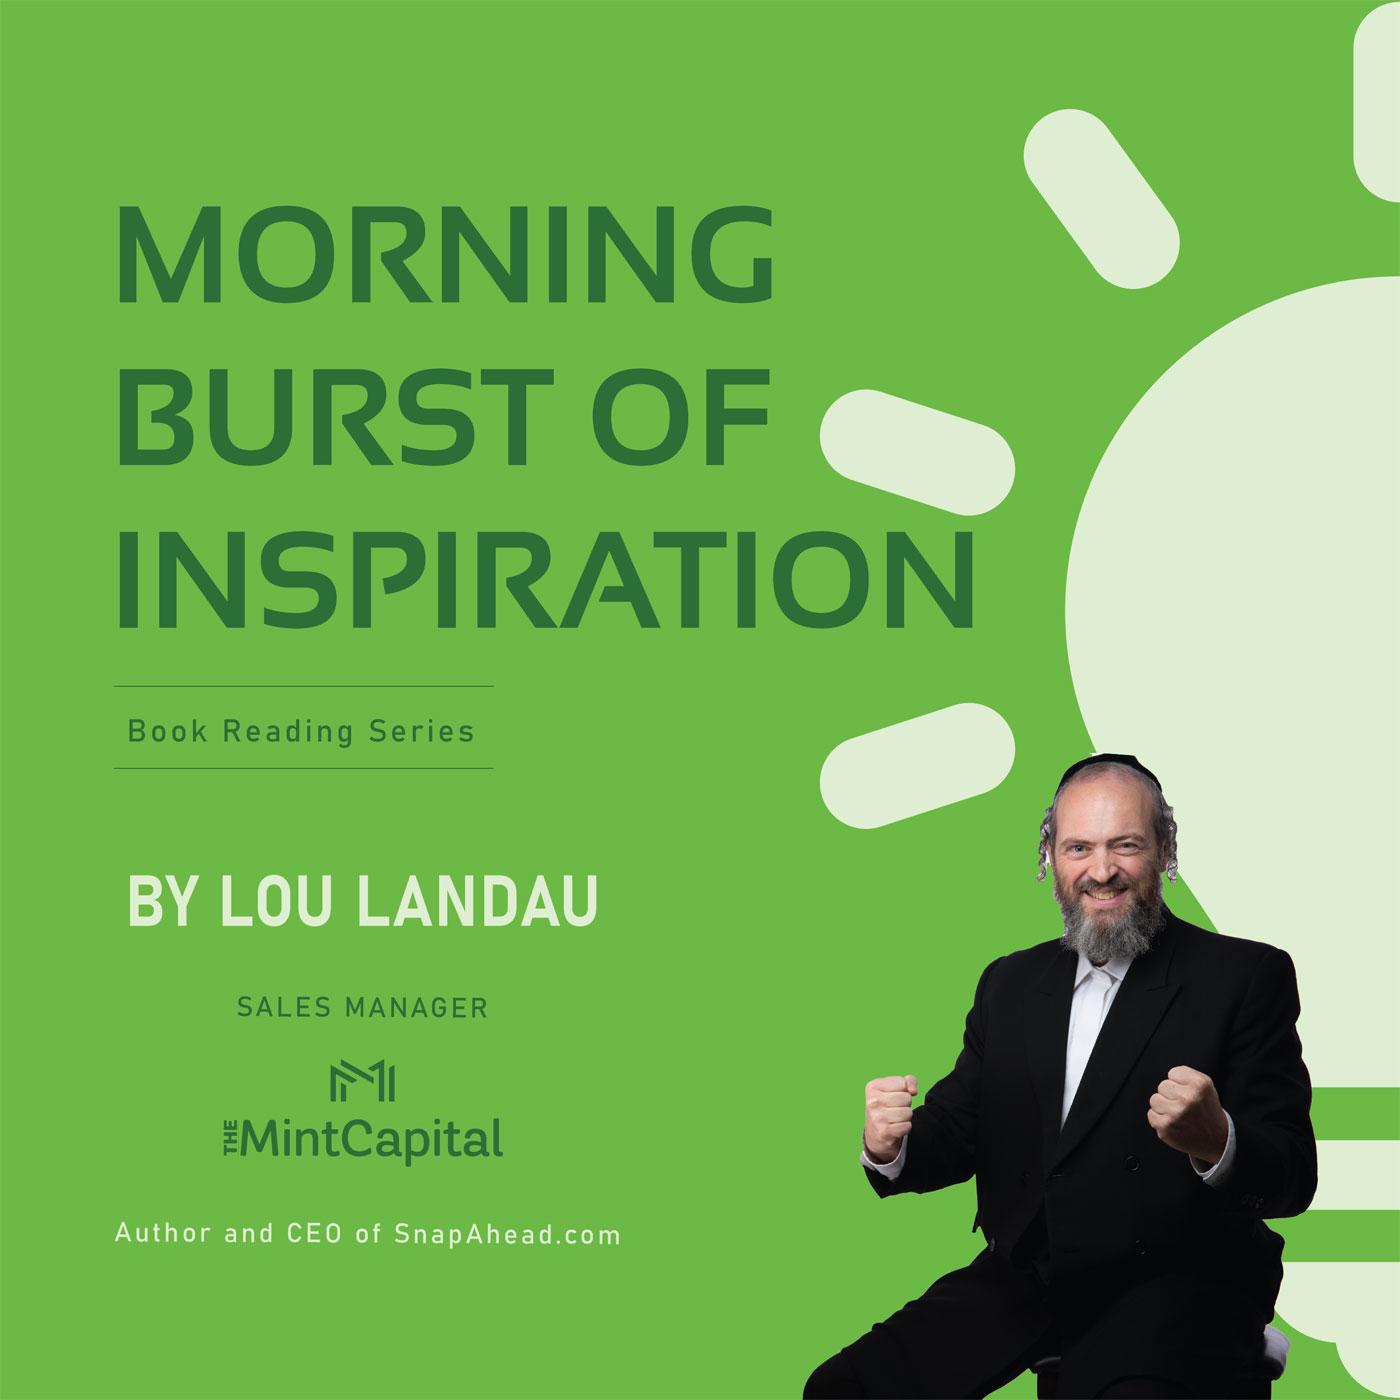 Morning Burst of Inspiration